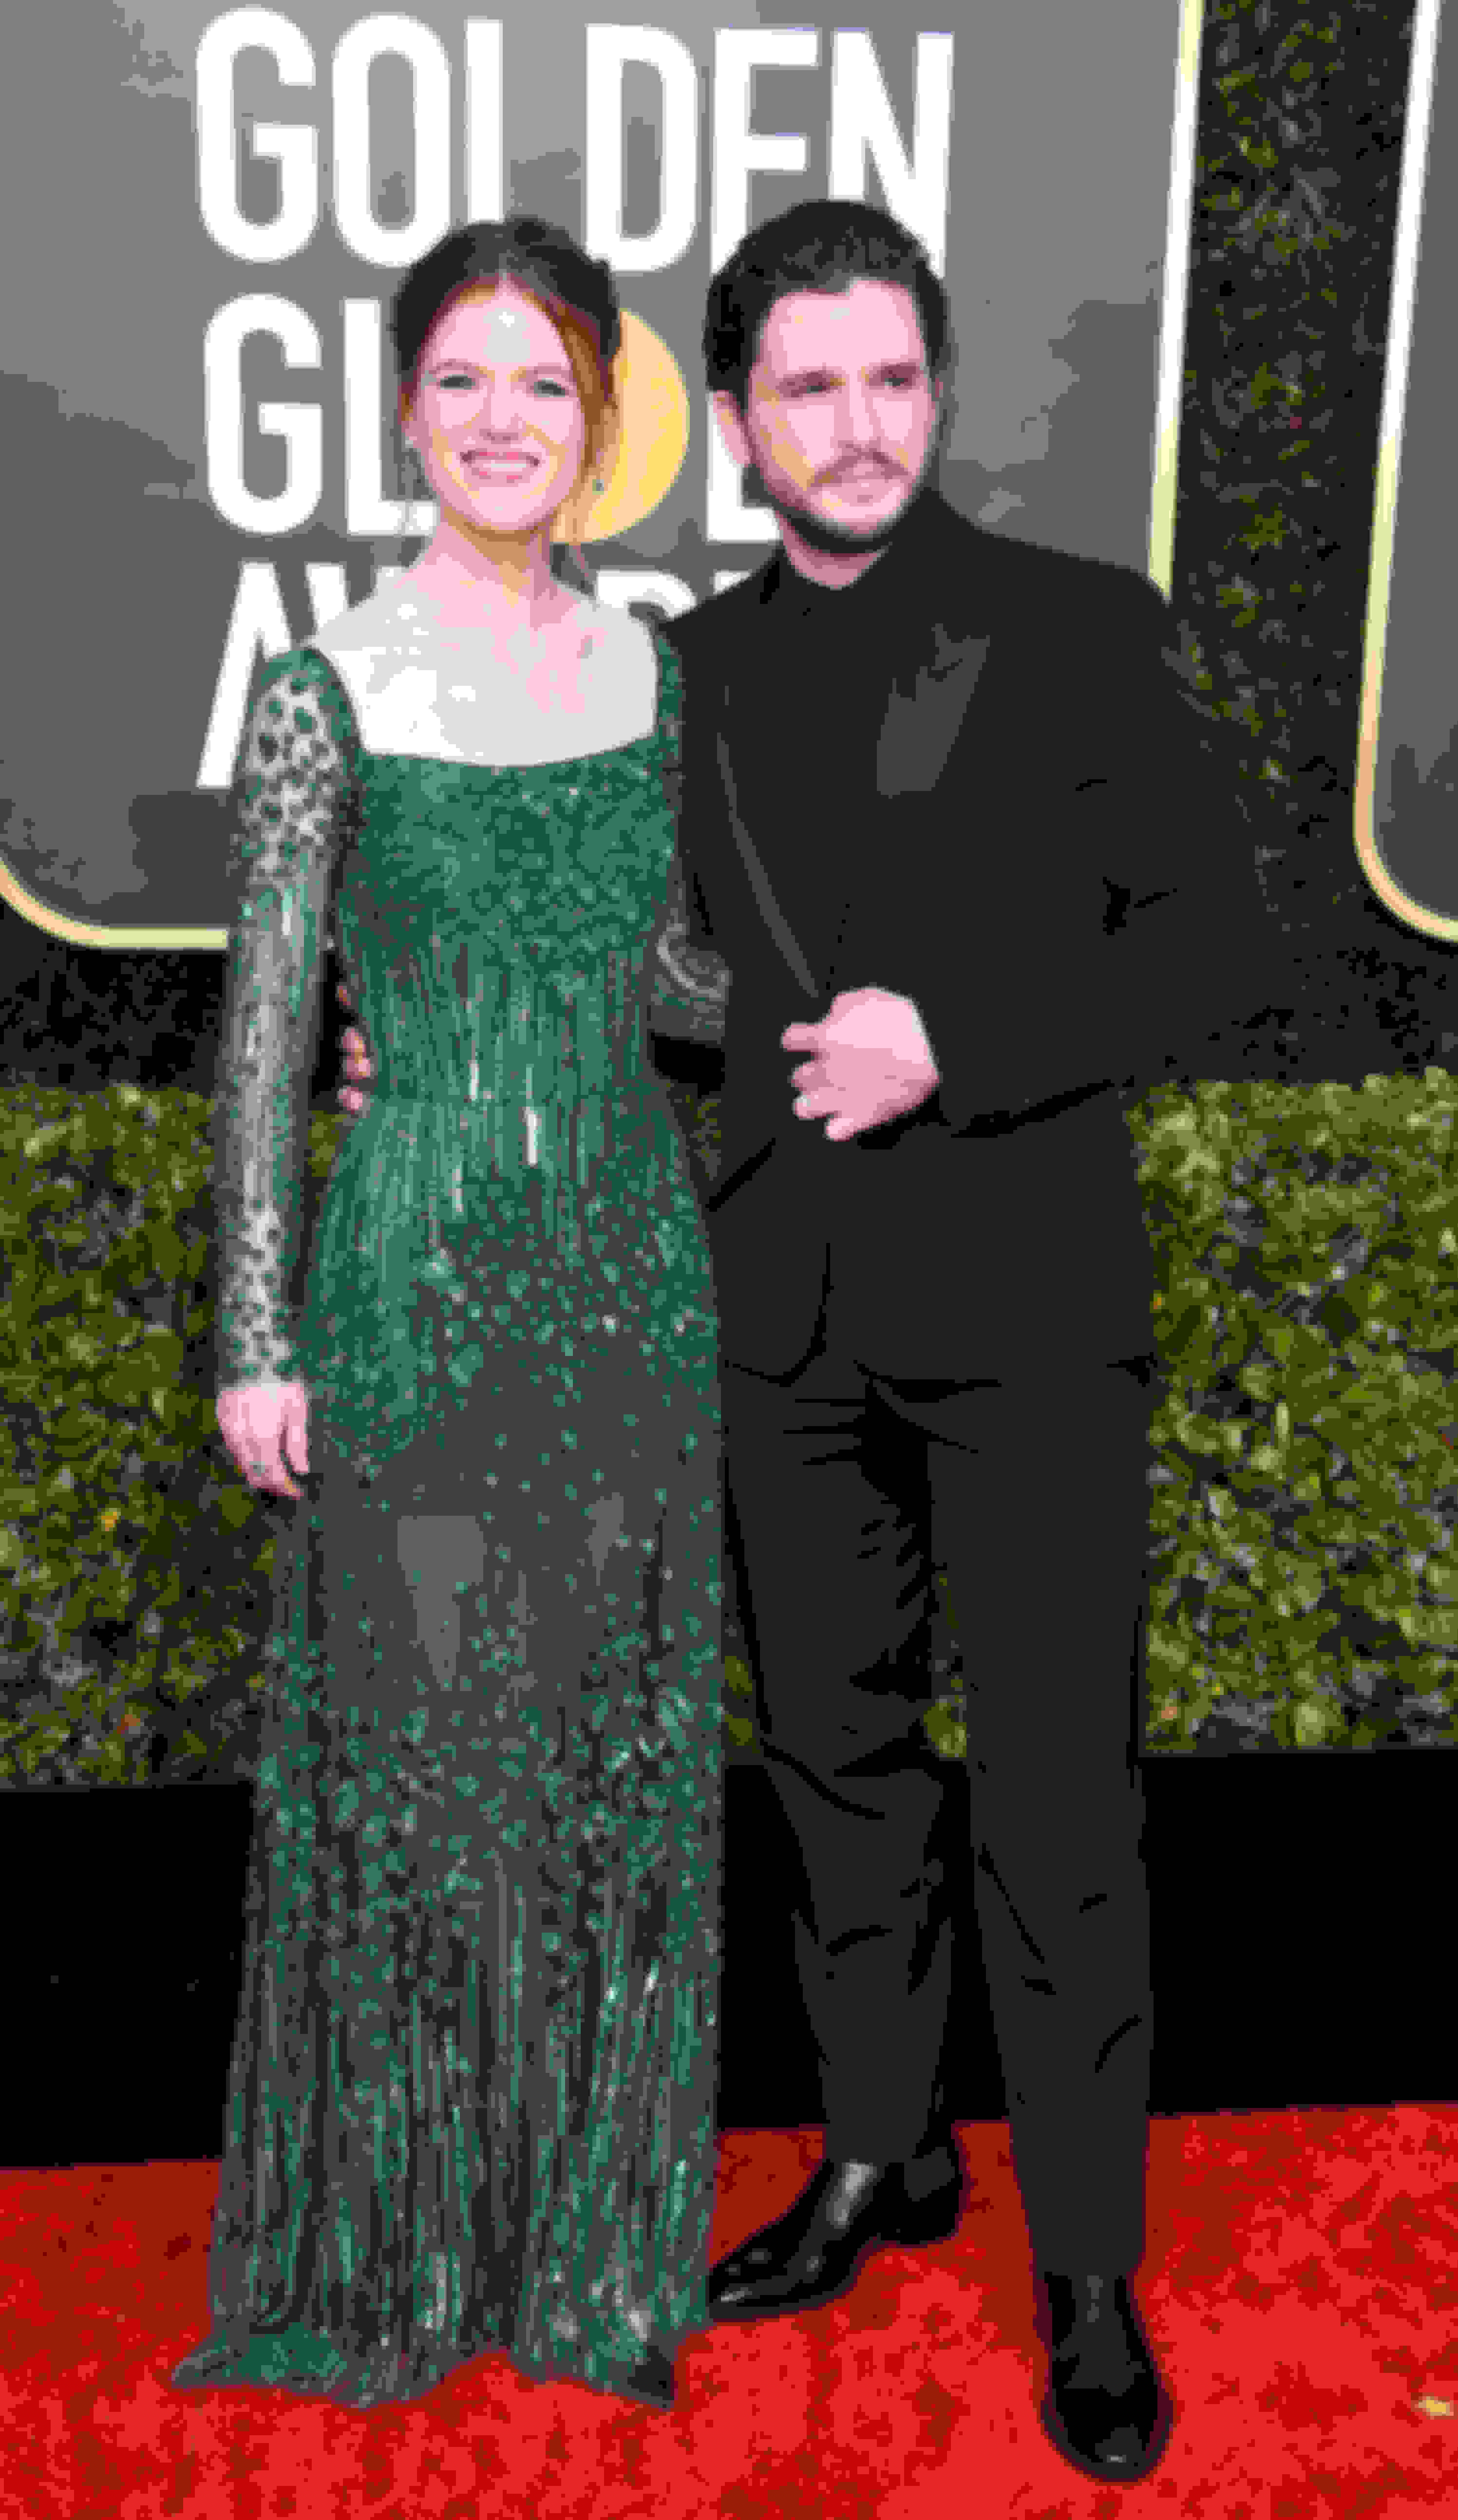 Kit Harington wearing SAWYER and Rose Leslie wearing Jimmy Choo pumps